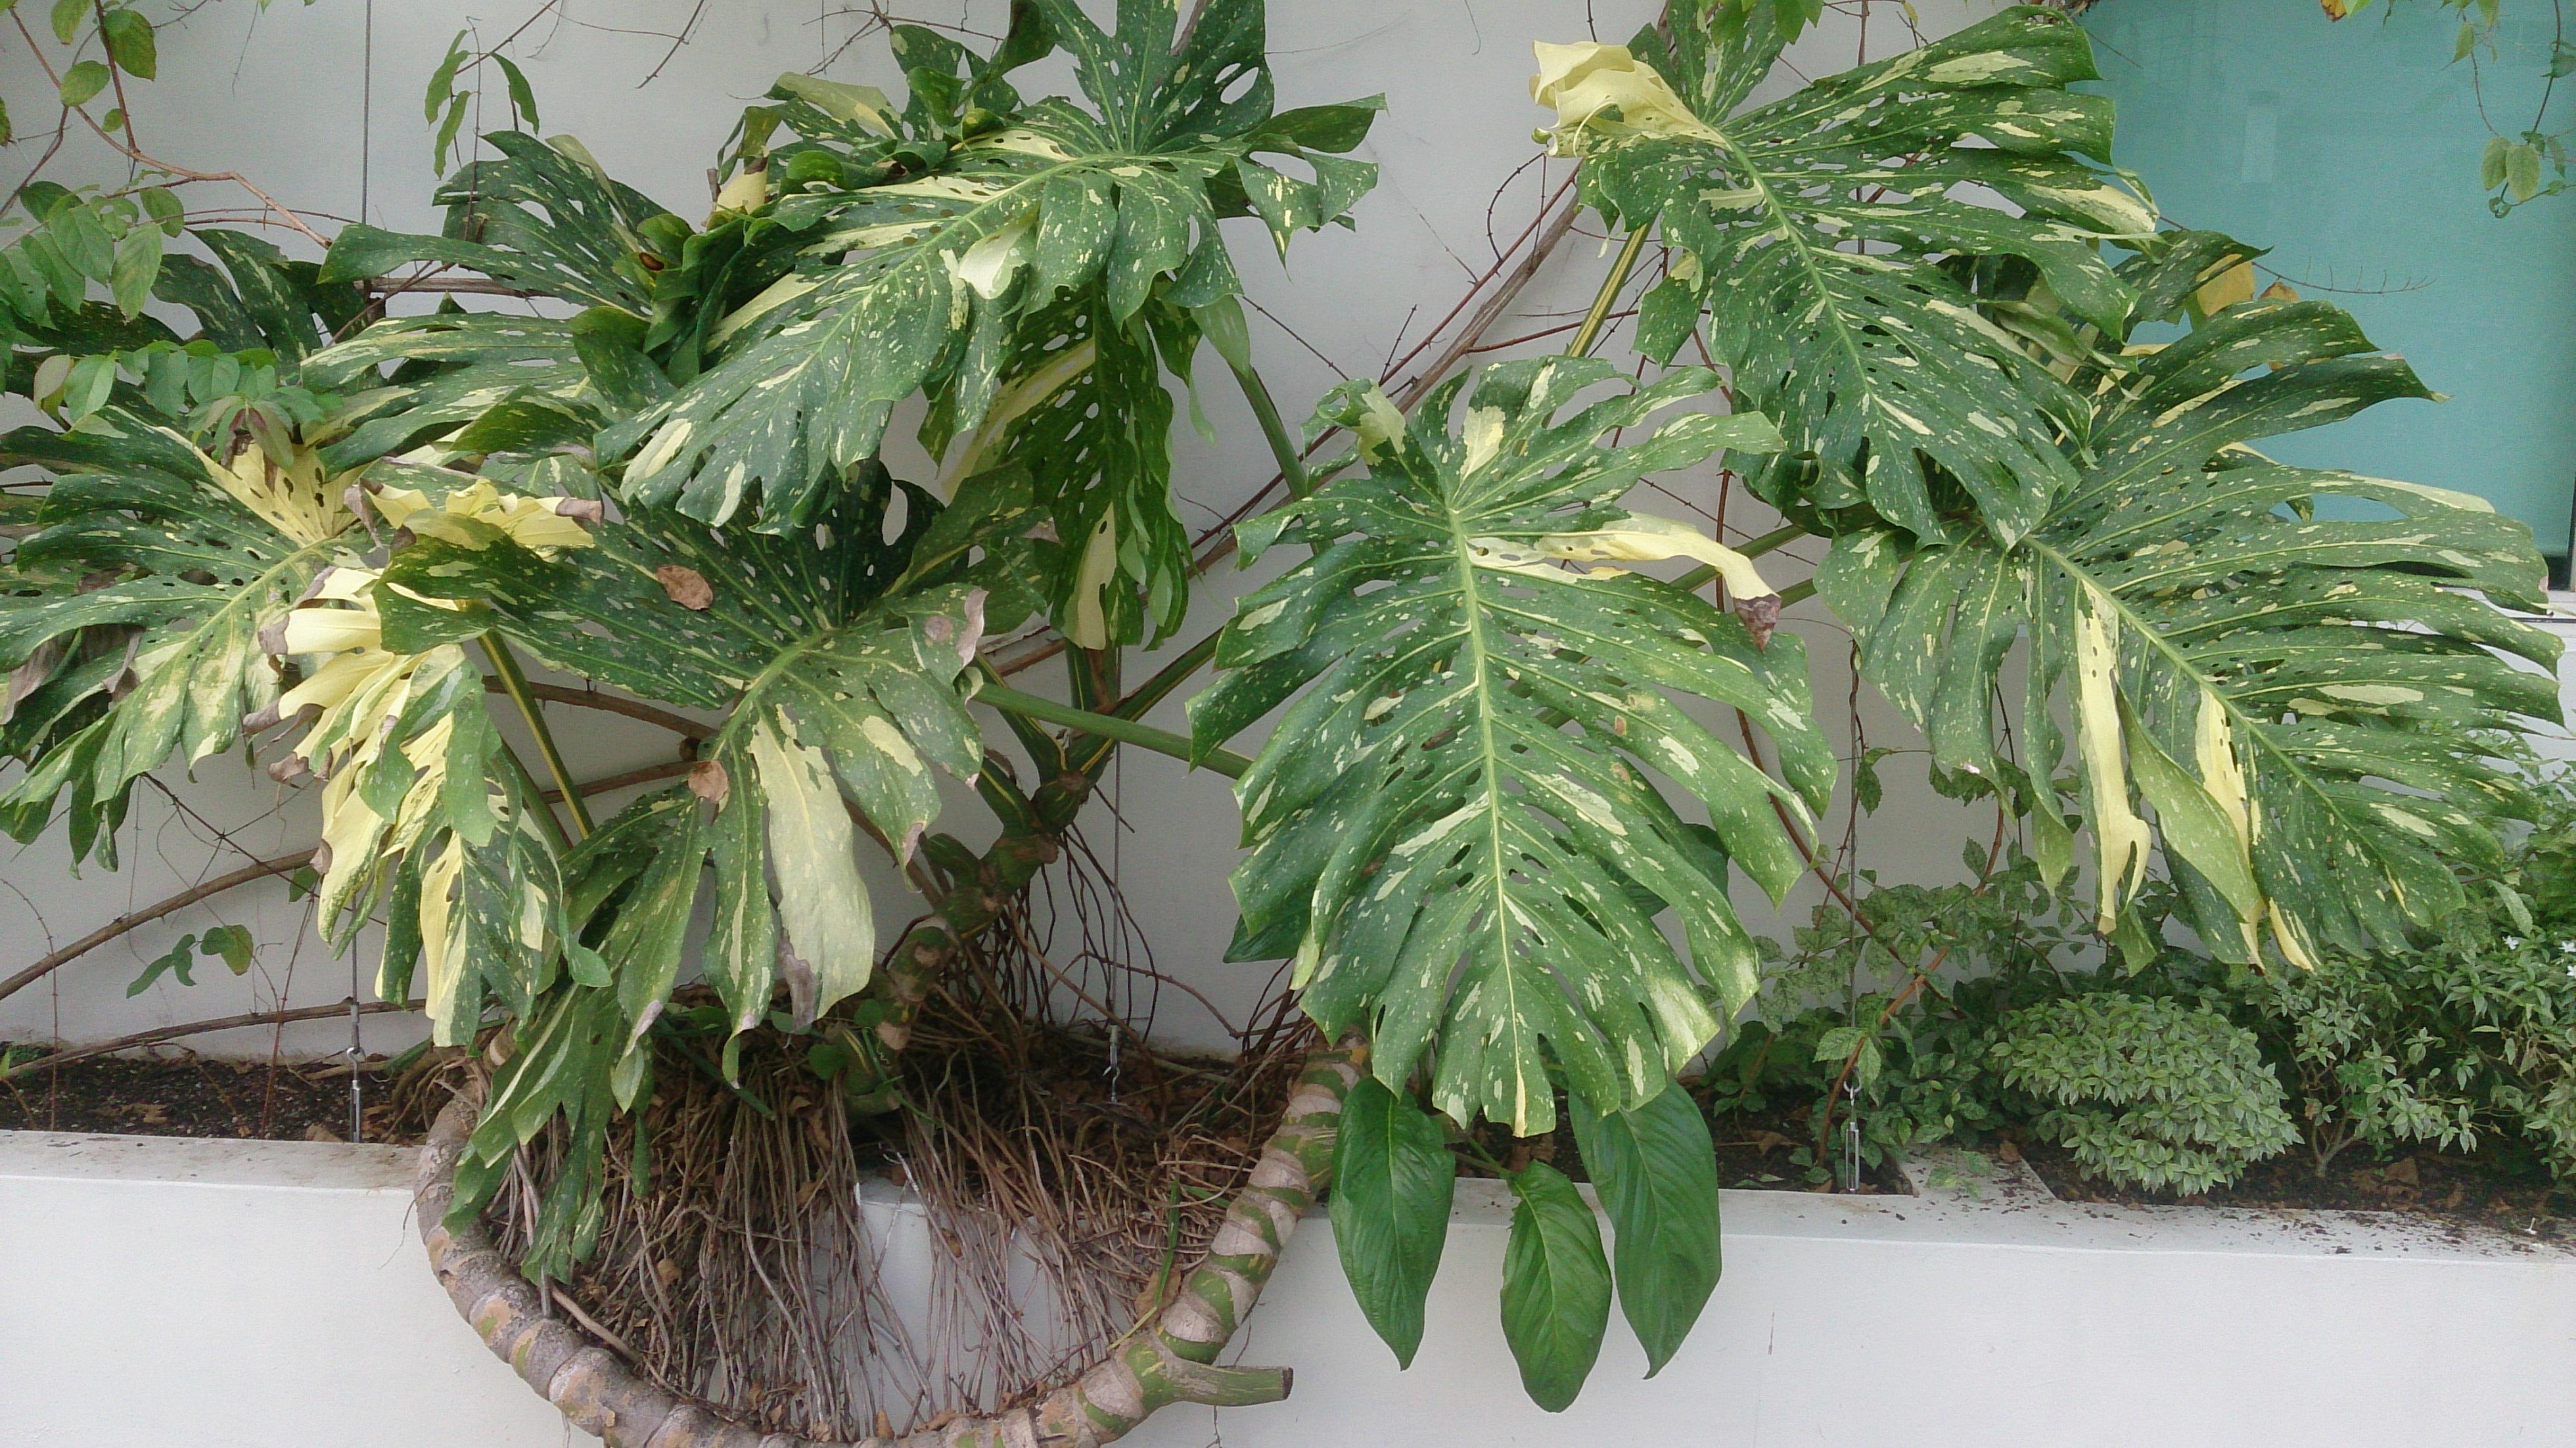 file fruit salad plant monstera deliciosa 39 albo variegata. Black Bedroom Furniture Sets. Home Design Ideas